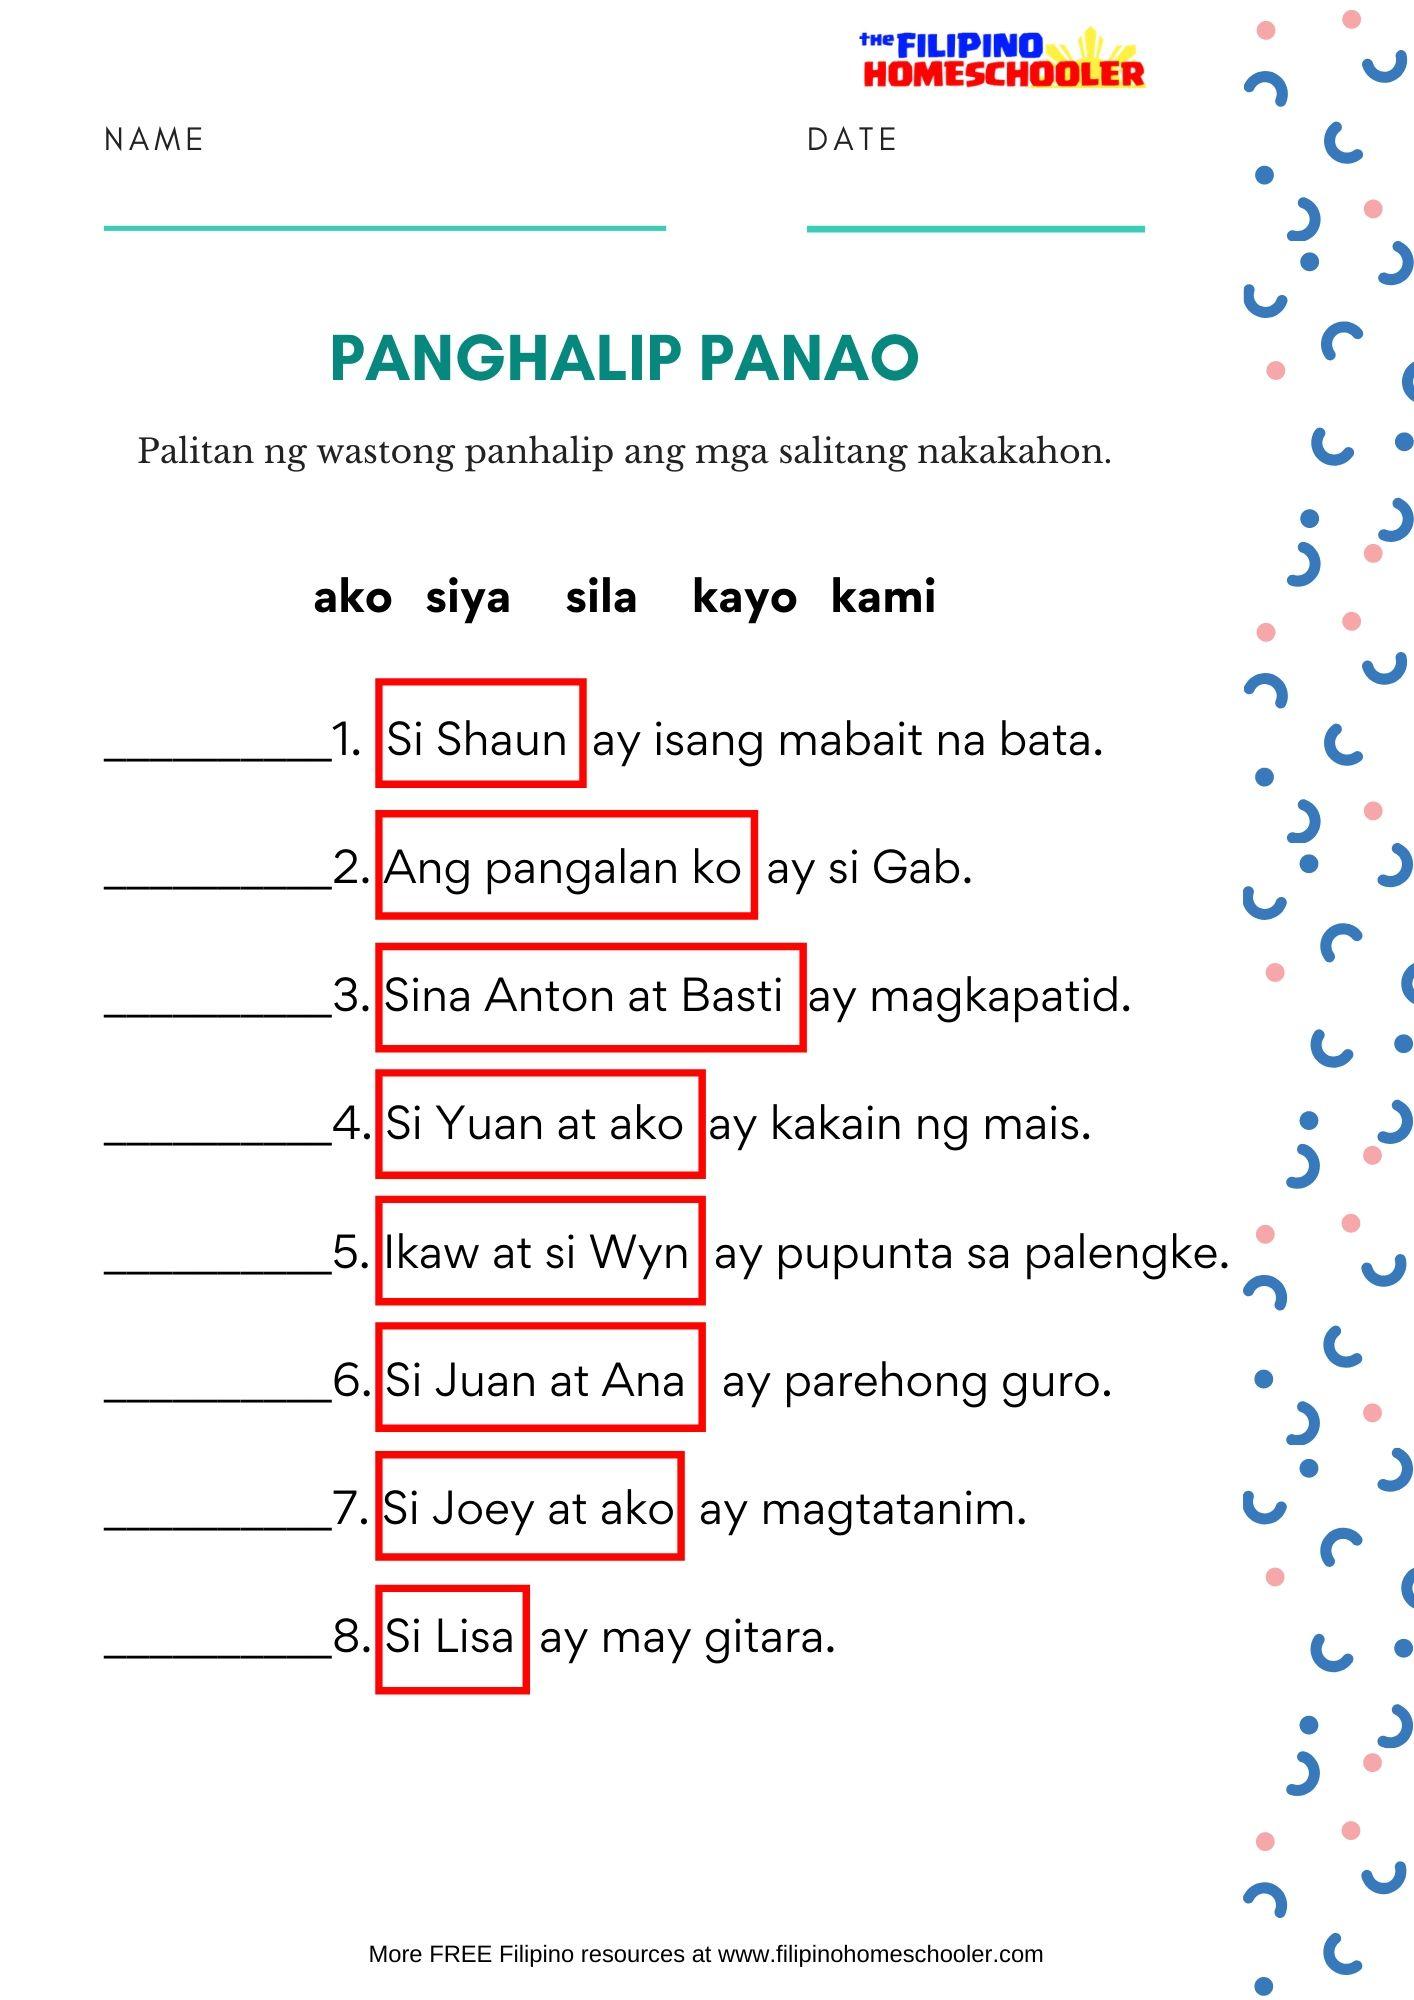 hight resolution of Free Panghalip Panao Worksheet SET 2 — The Filipino Homeschooler